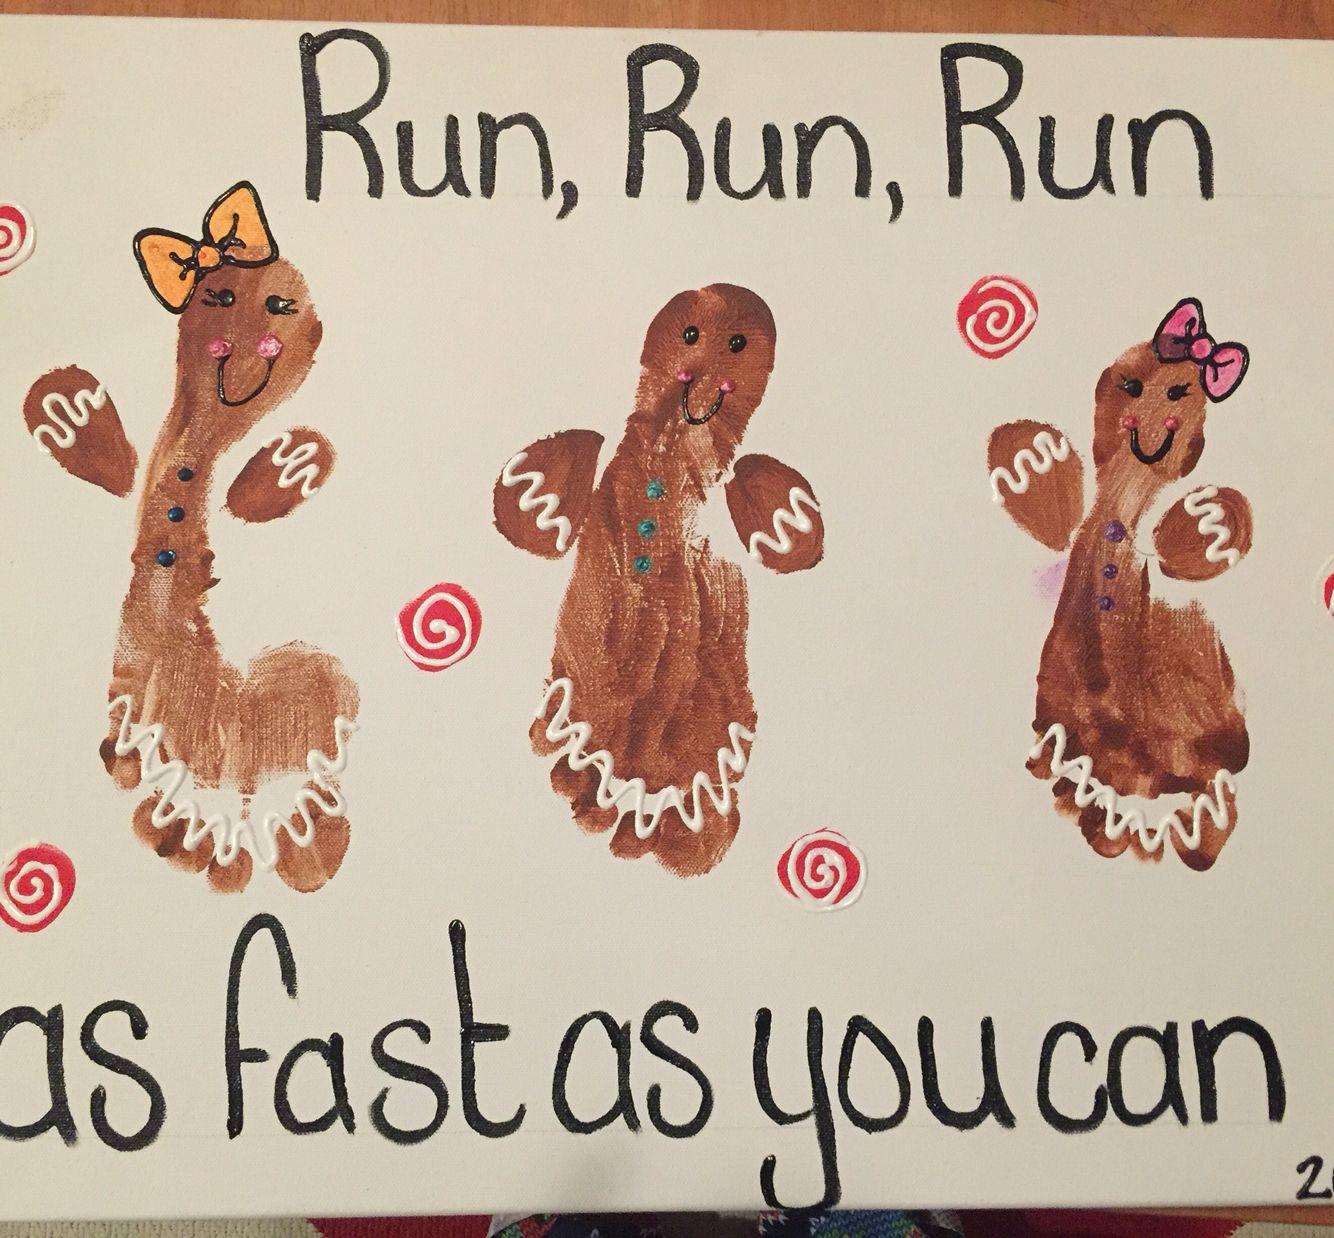 Gingerbread Man Footprints Preschool Christmas Crafts Fun Christmas Crafts Christmas Crafts For Toddlers Gingerbread man art activities for